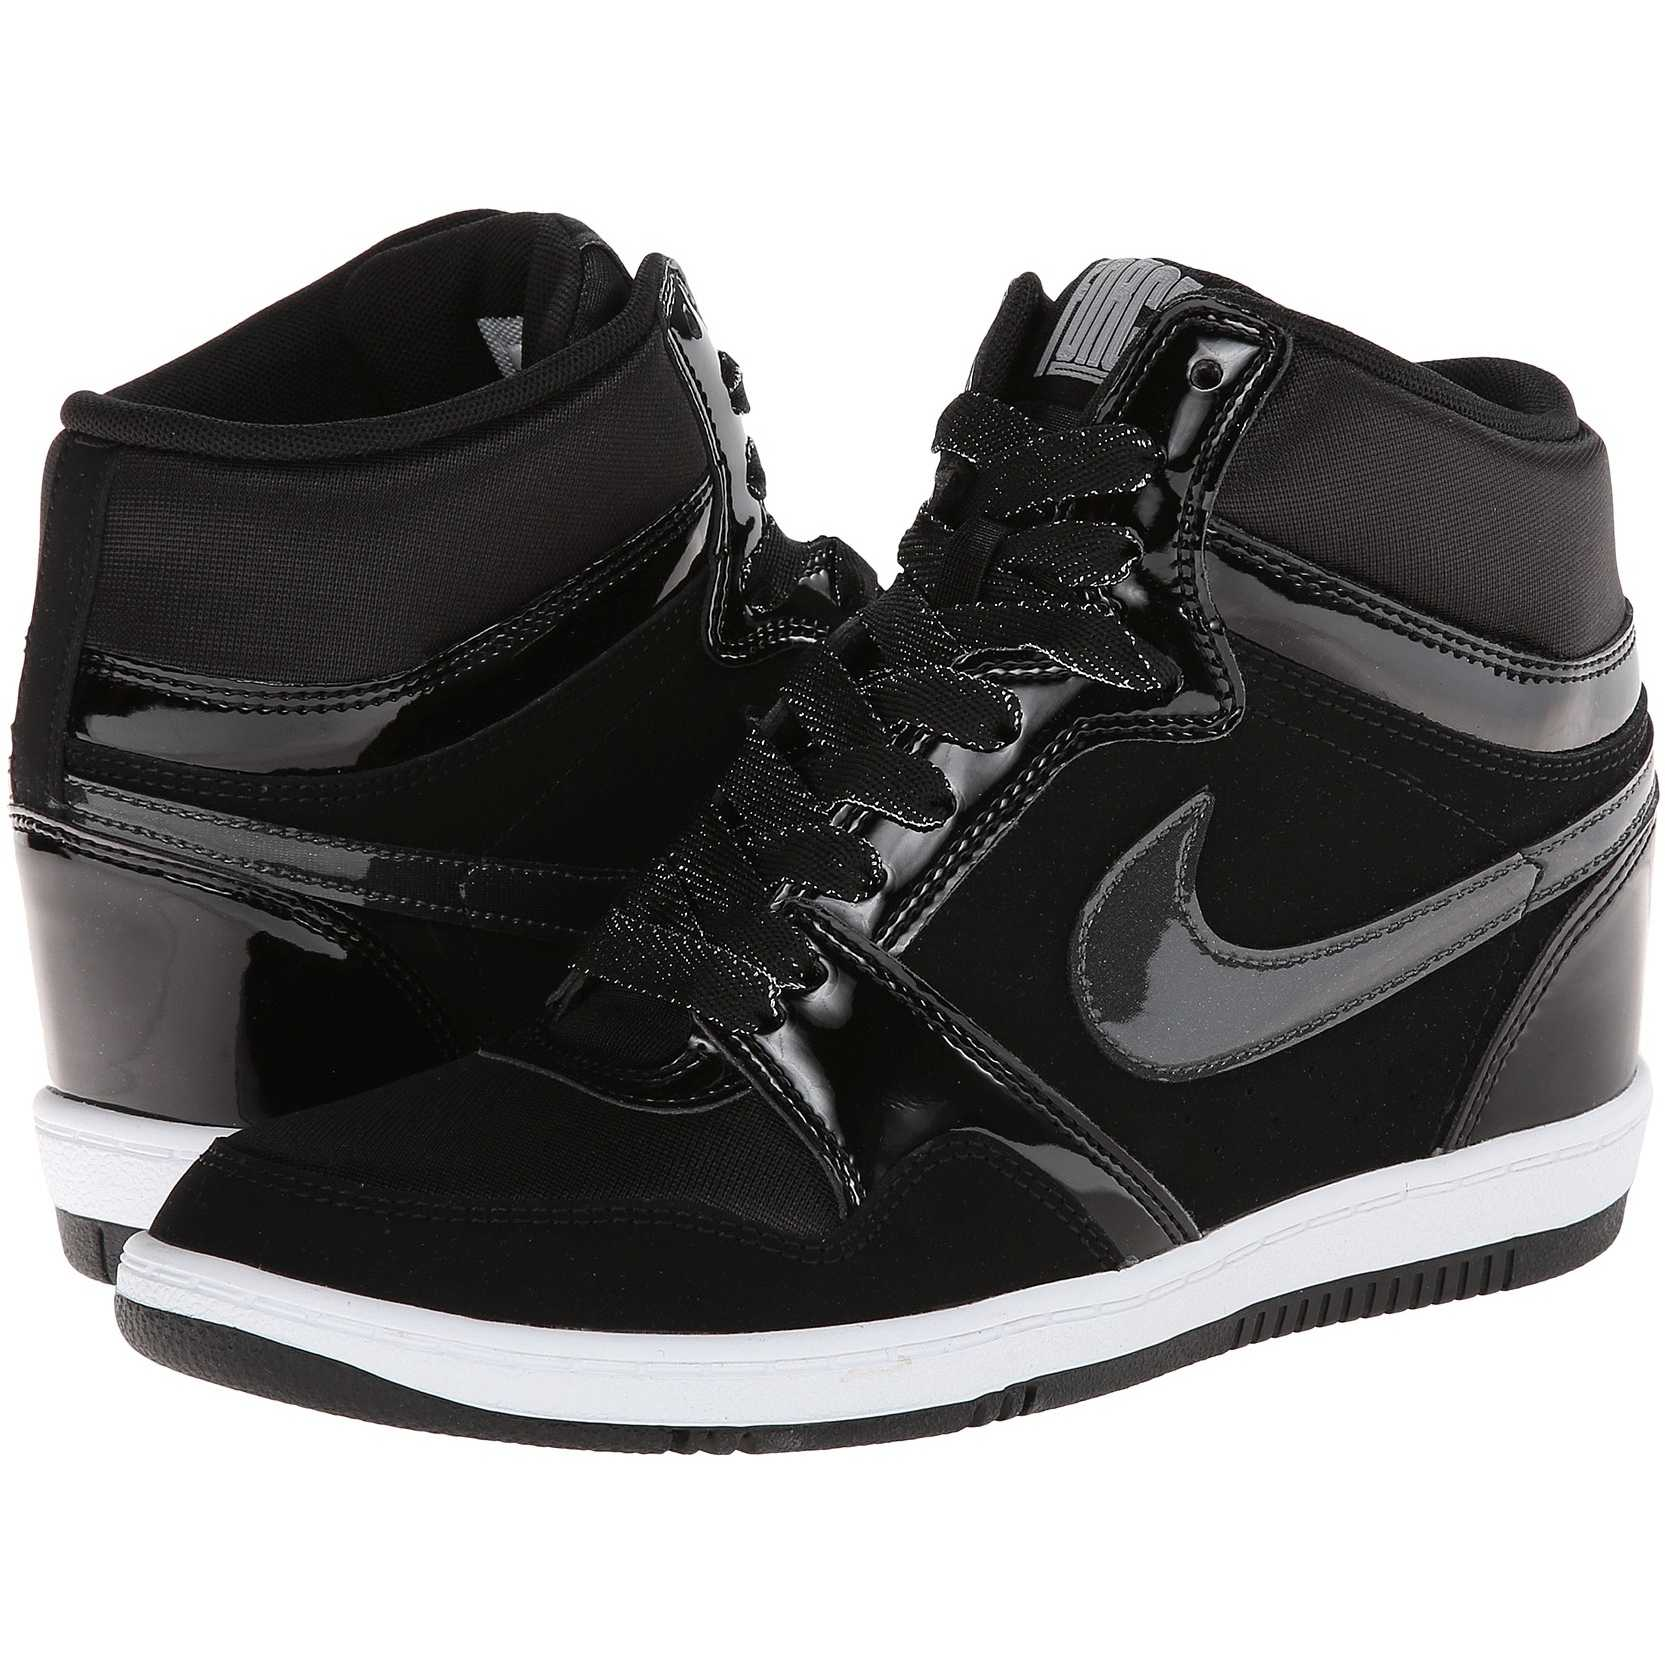 Nike Force Sky High Sneaker Wedge Black/Black/White/Anthracite pentru dama